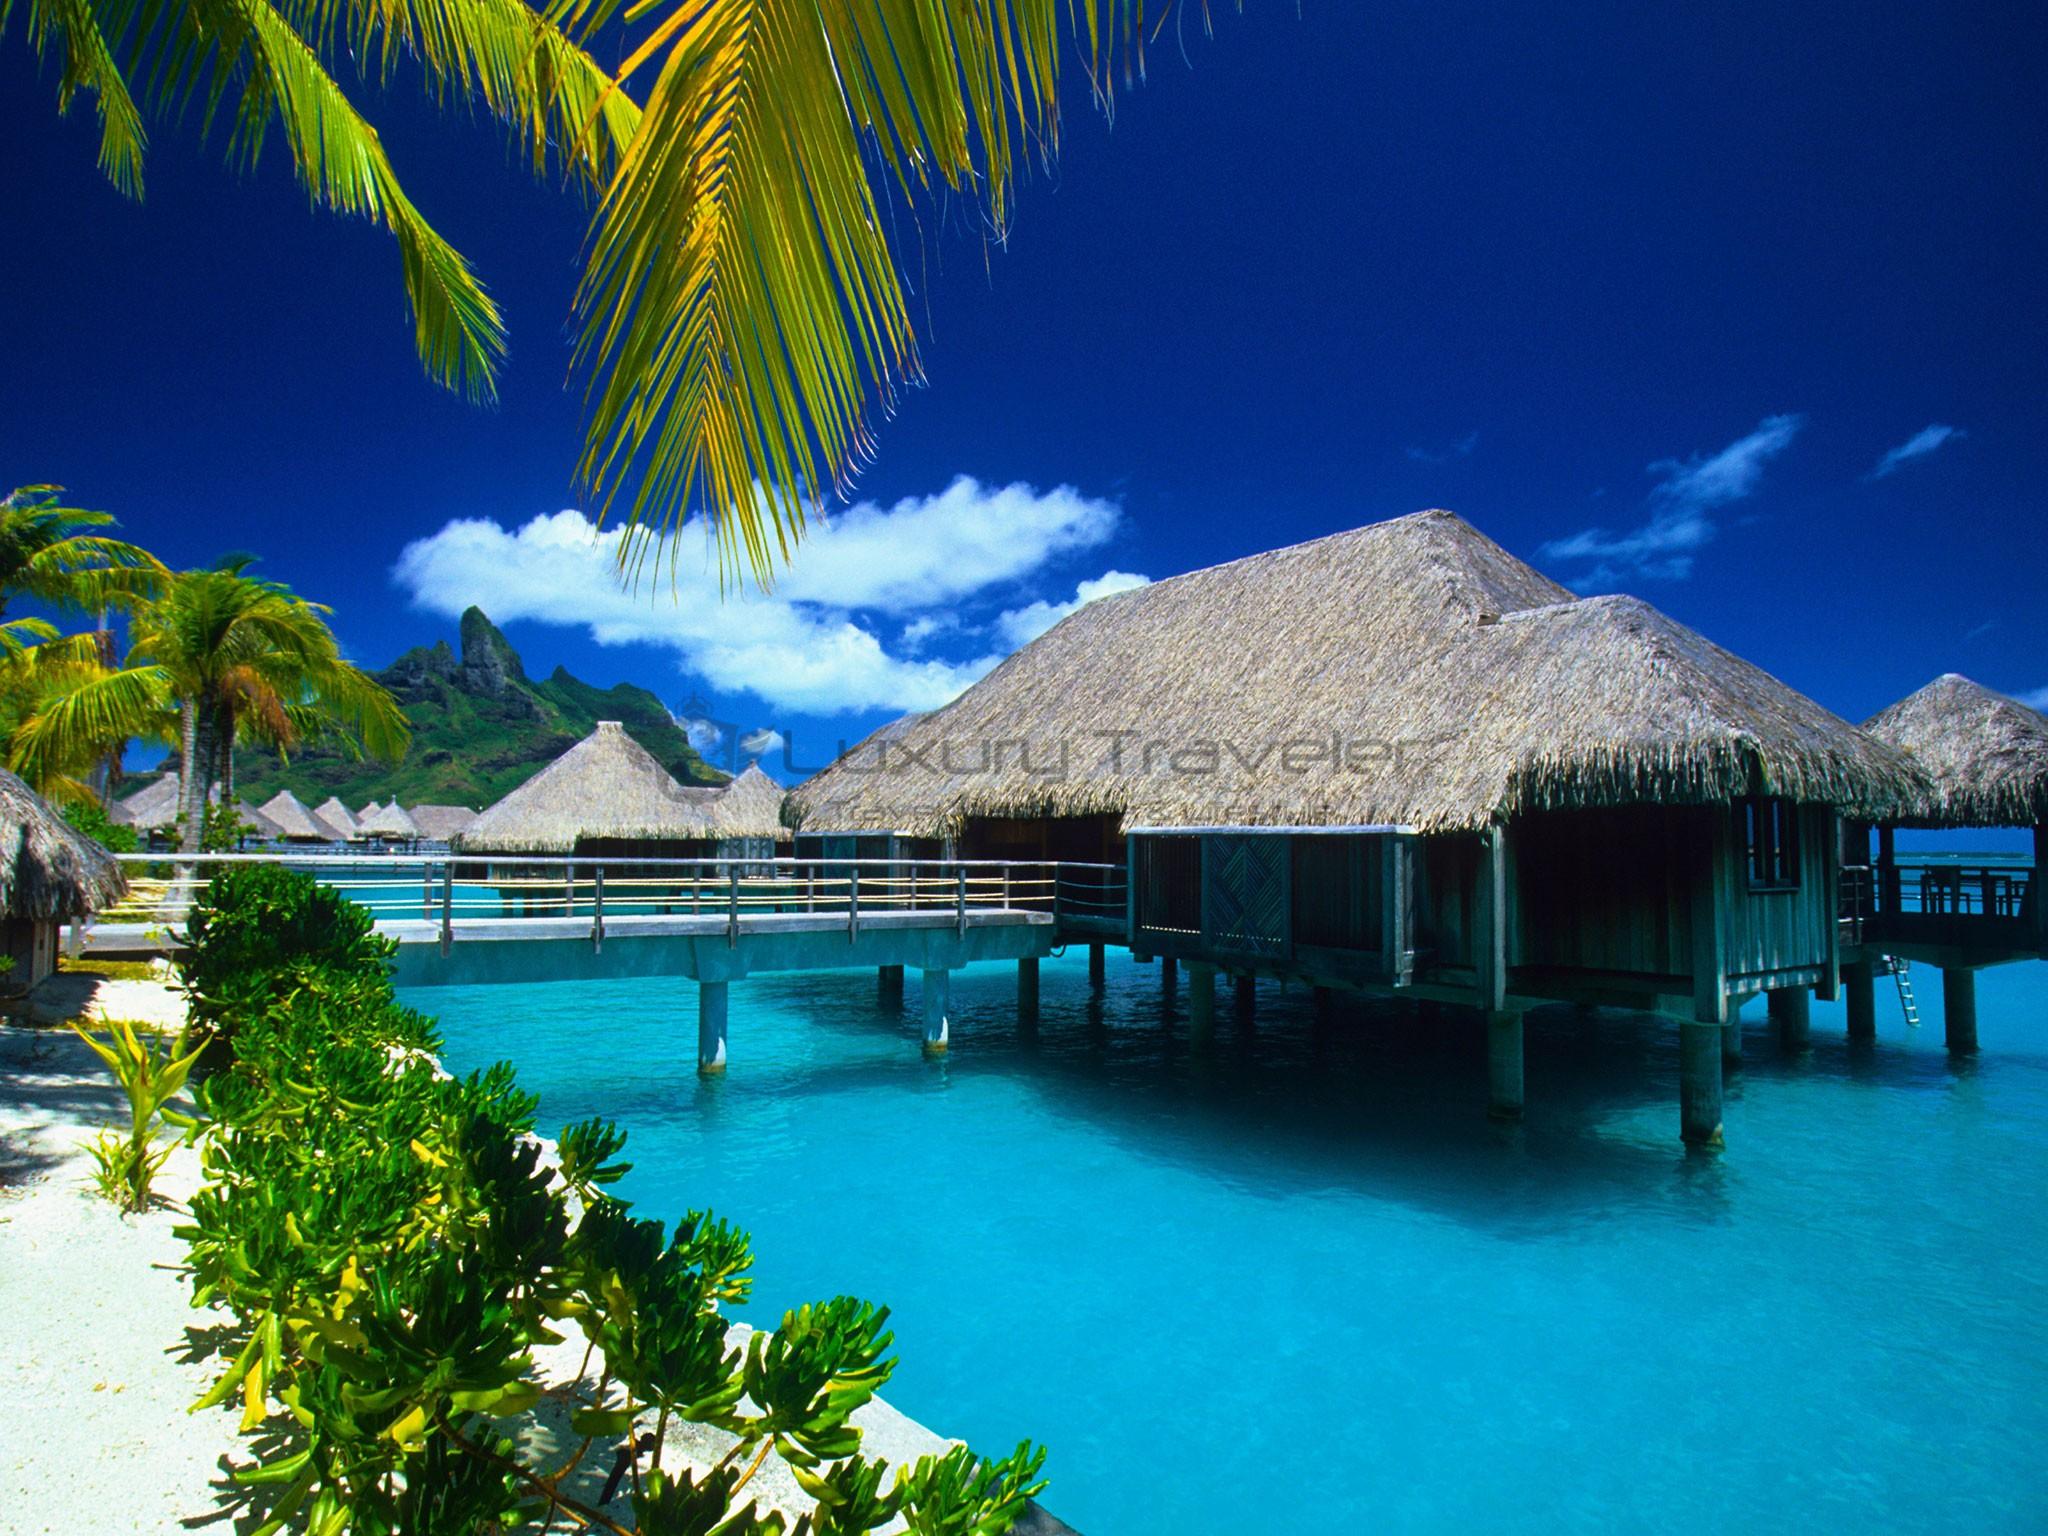 St_Regis_Bora_Bora_French_Polynesia_Resort_Luxury